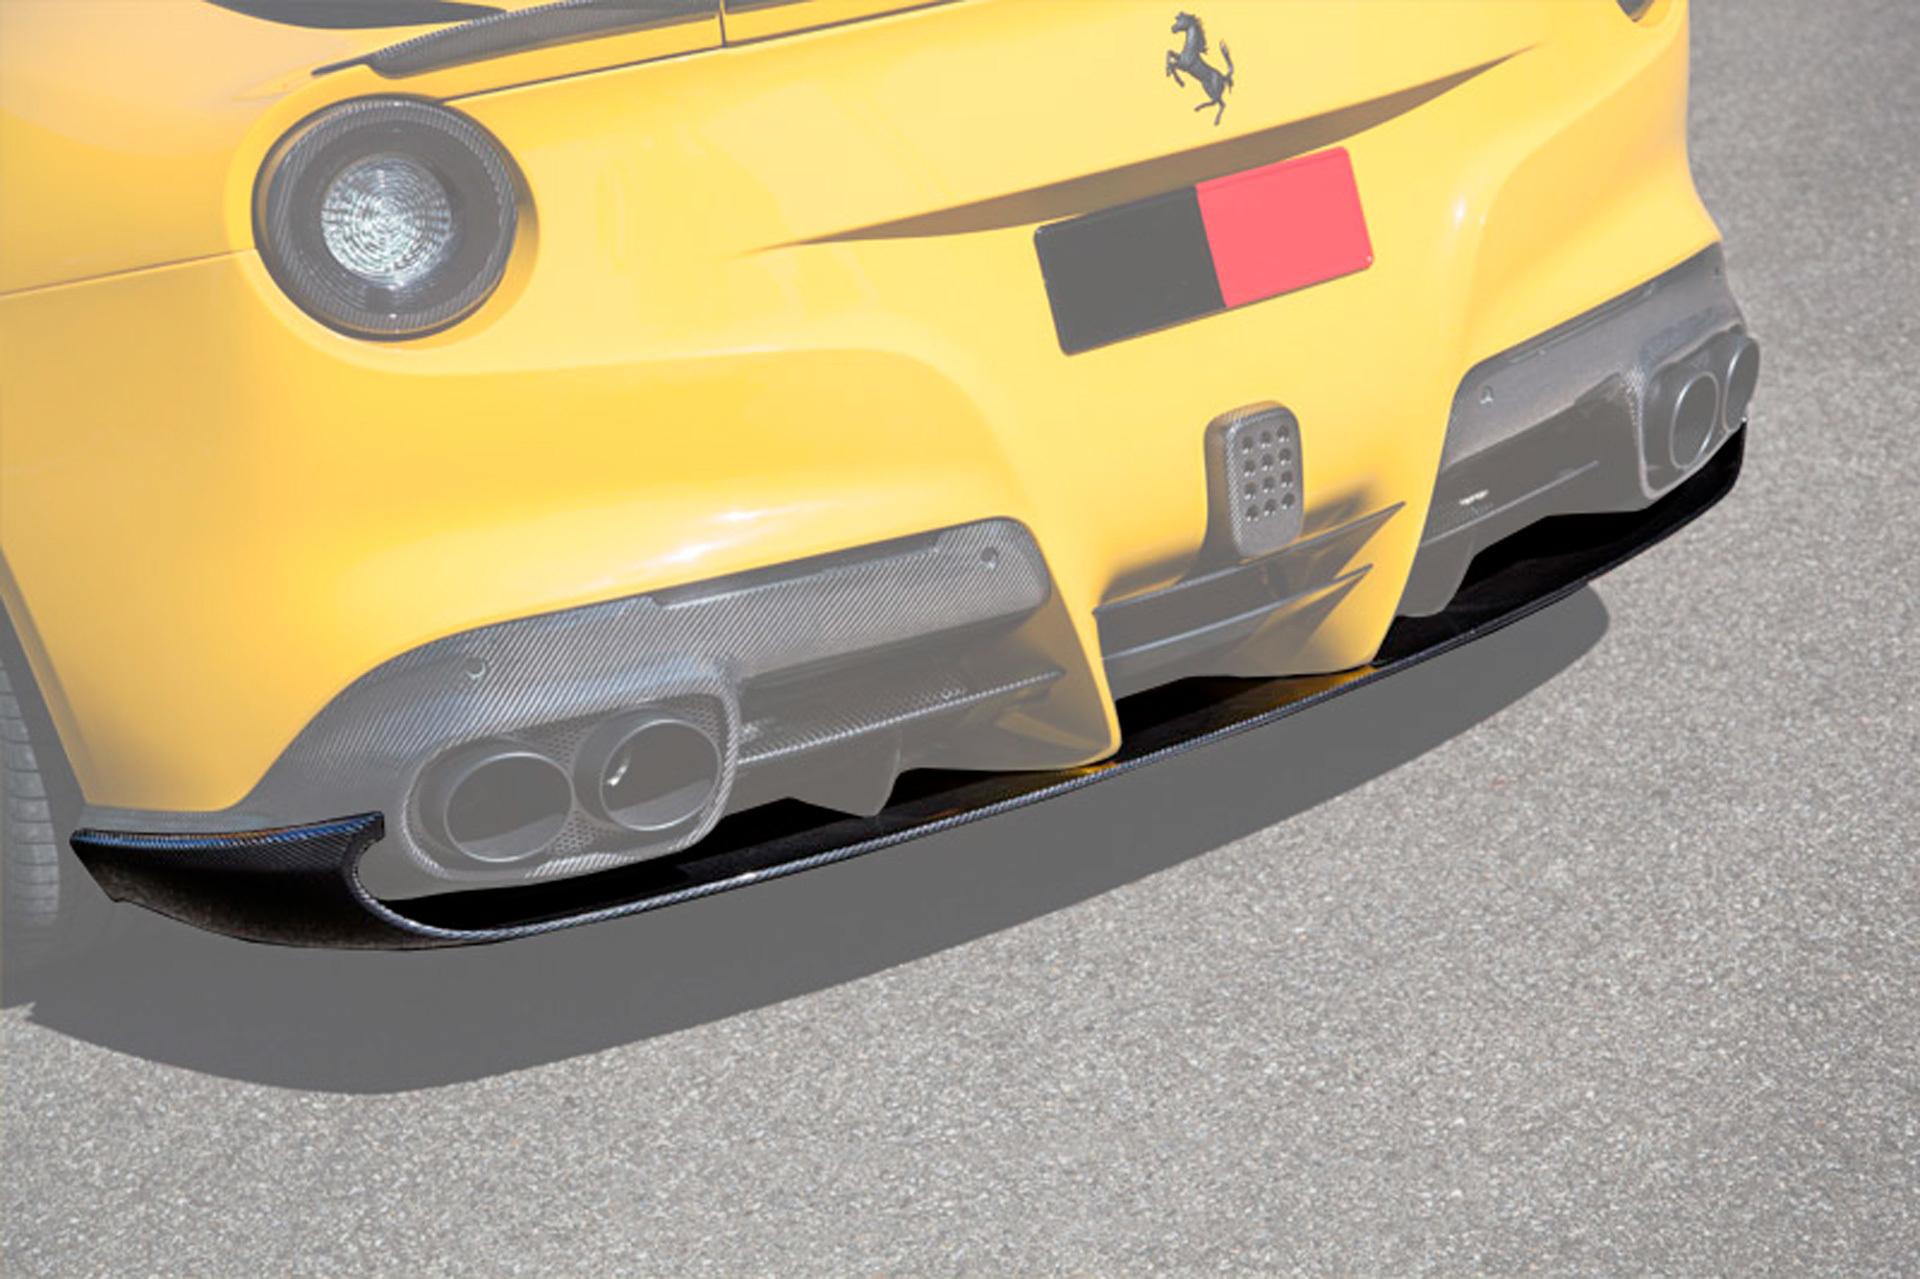 Hodoor Performance Carbon fiber bottom diffuser Novitec Style for Ferrari F12 Berlinetta